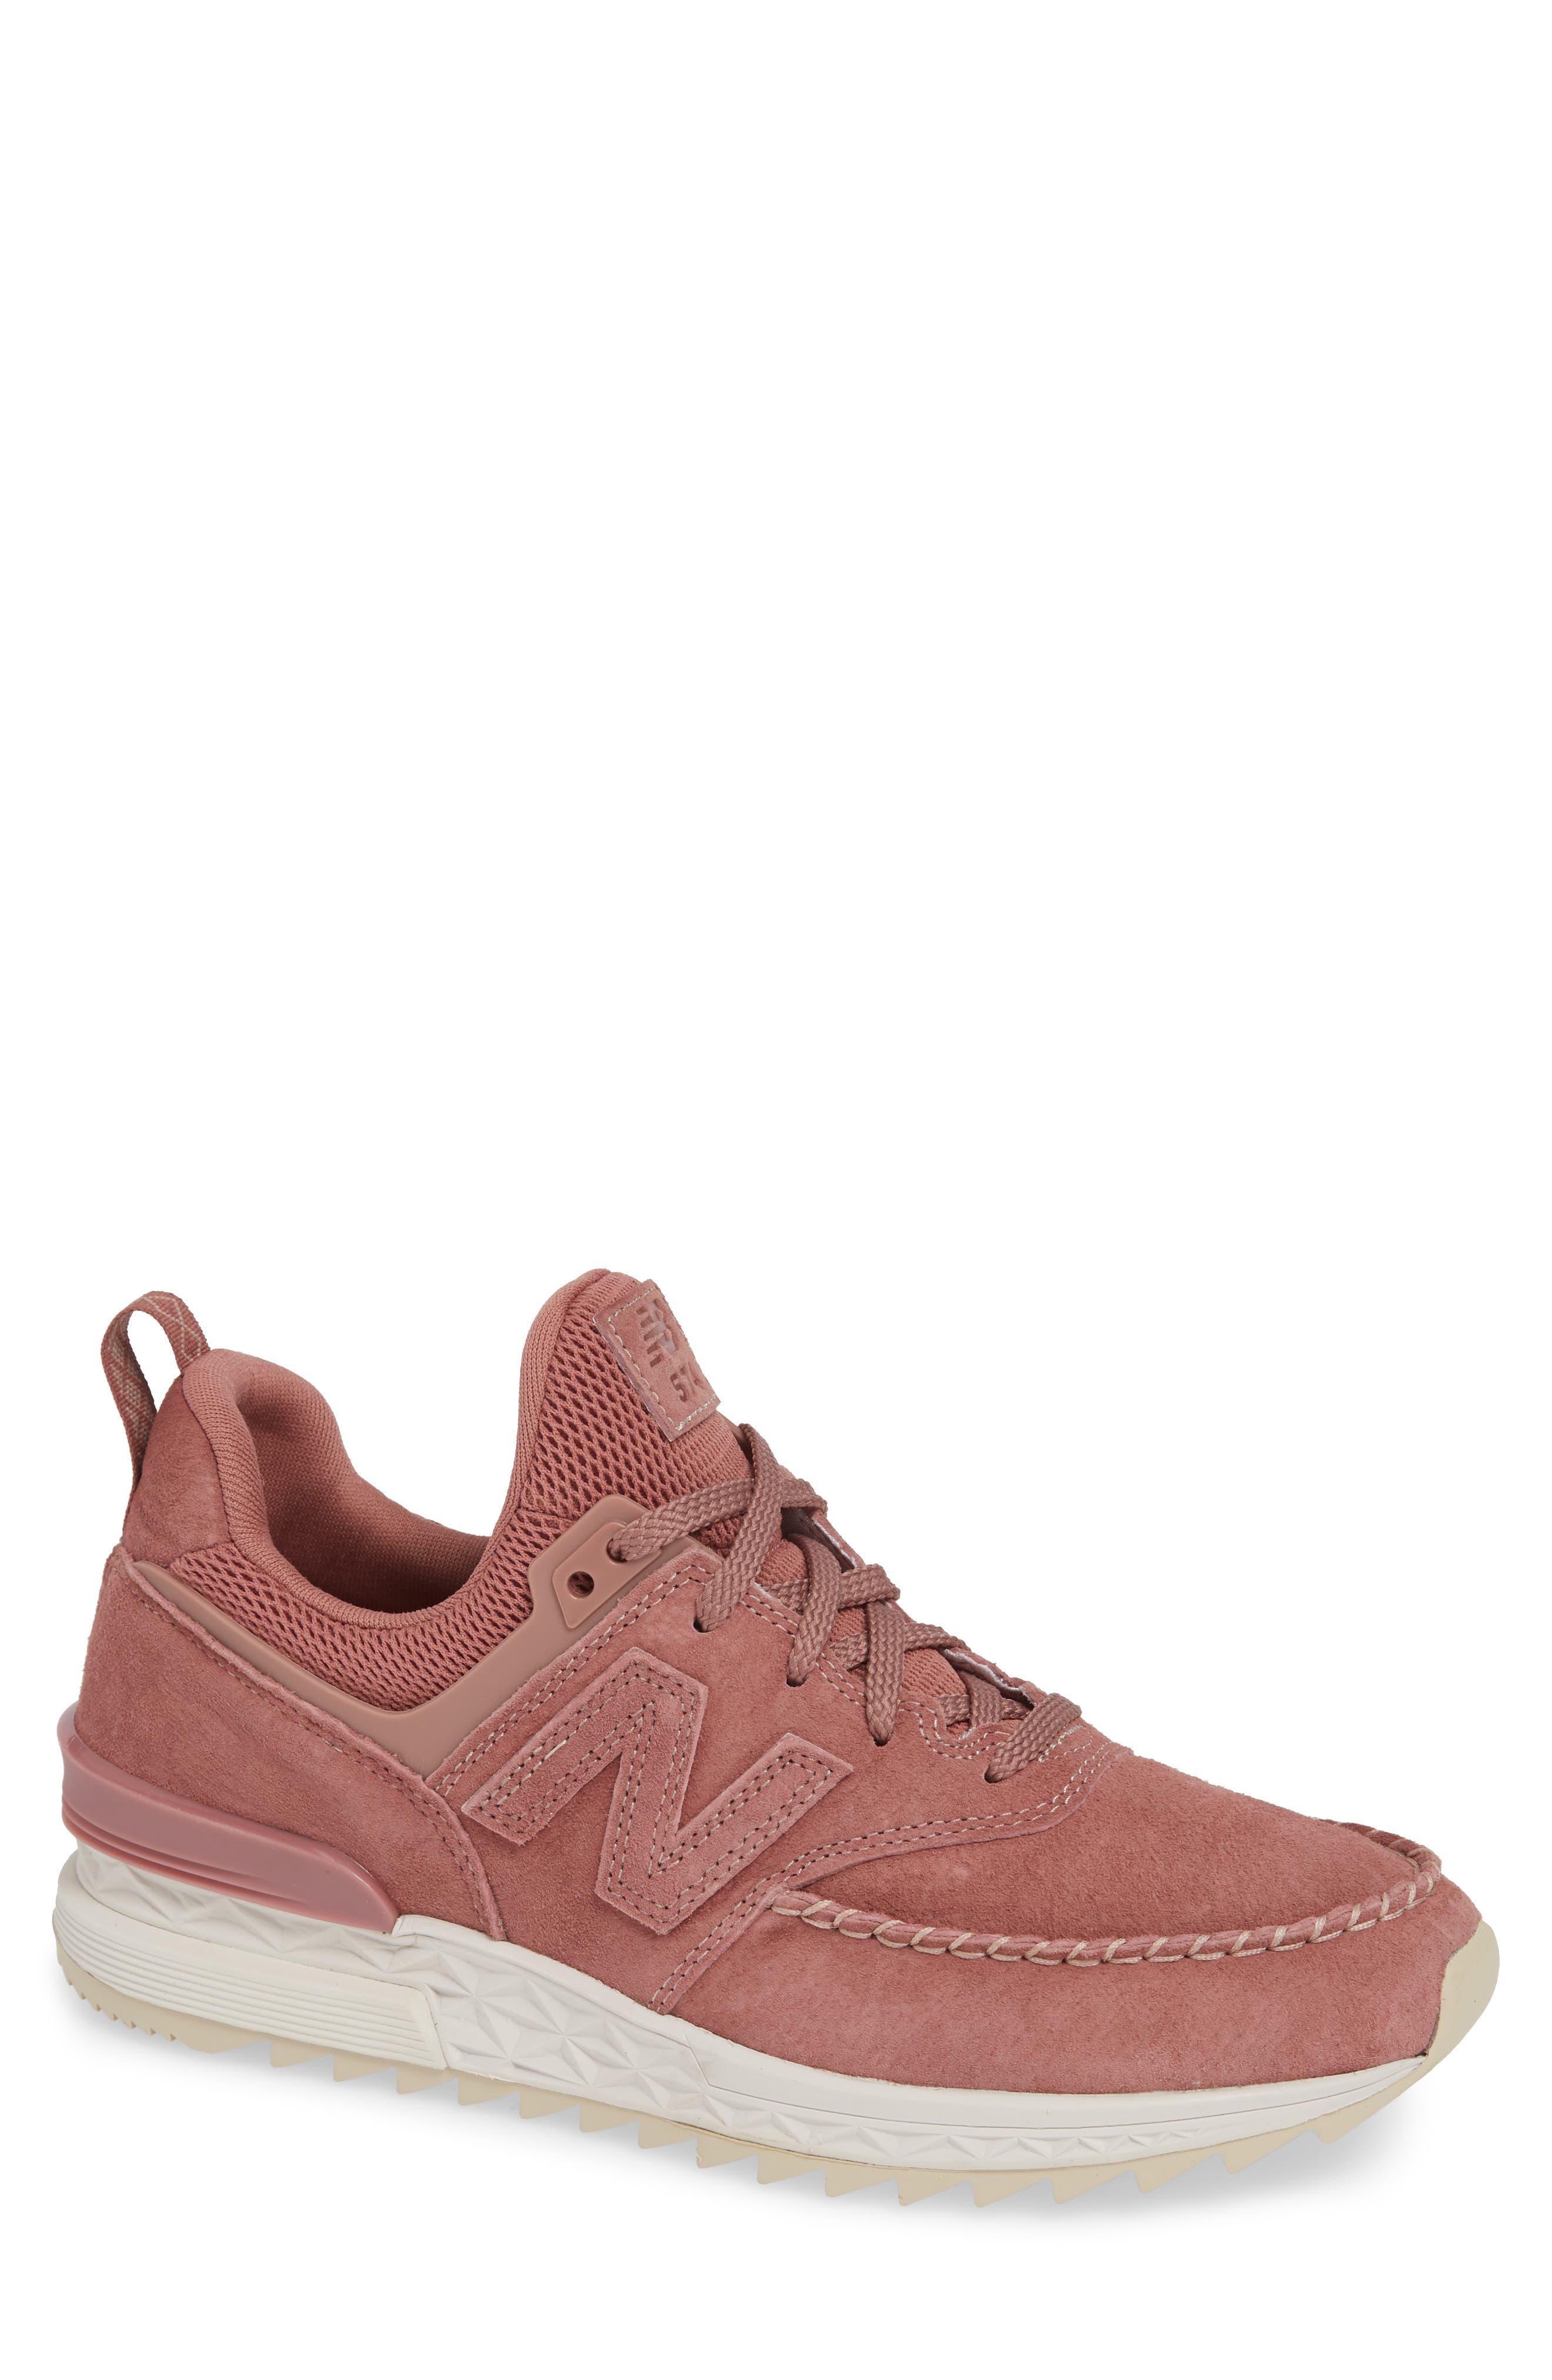 574 Sport Sneaker,                         Main,                         color, DARK OXIDE SUEDE/ MESH